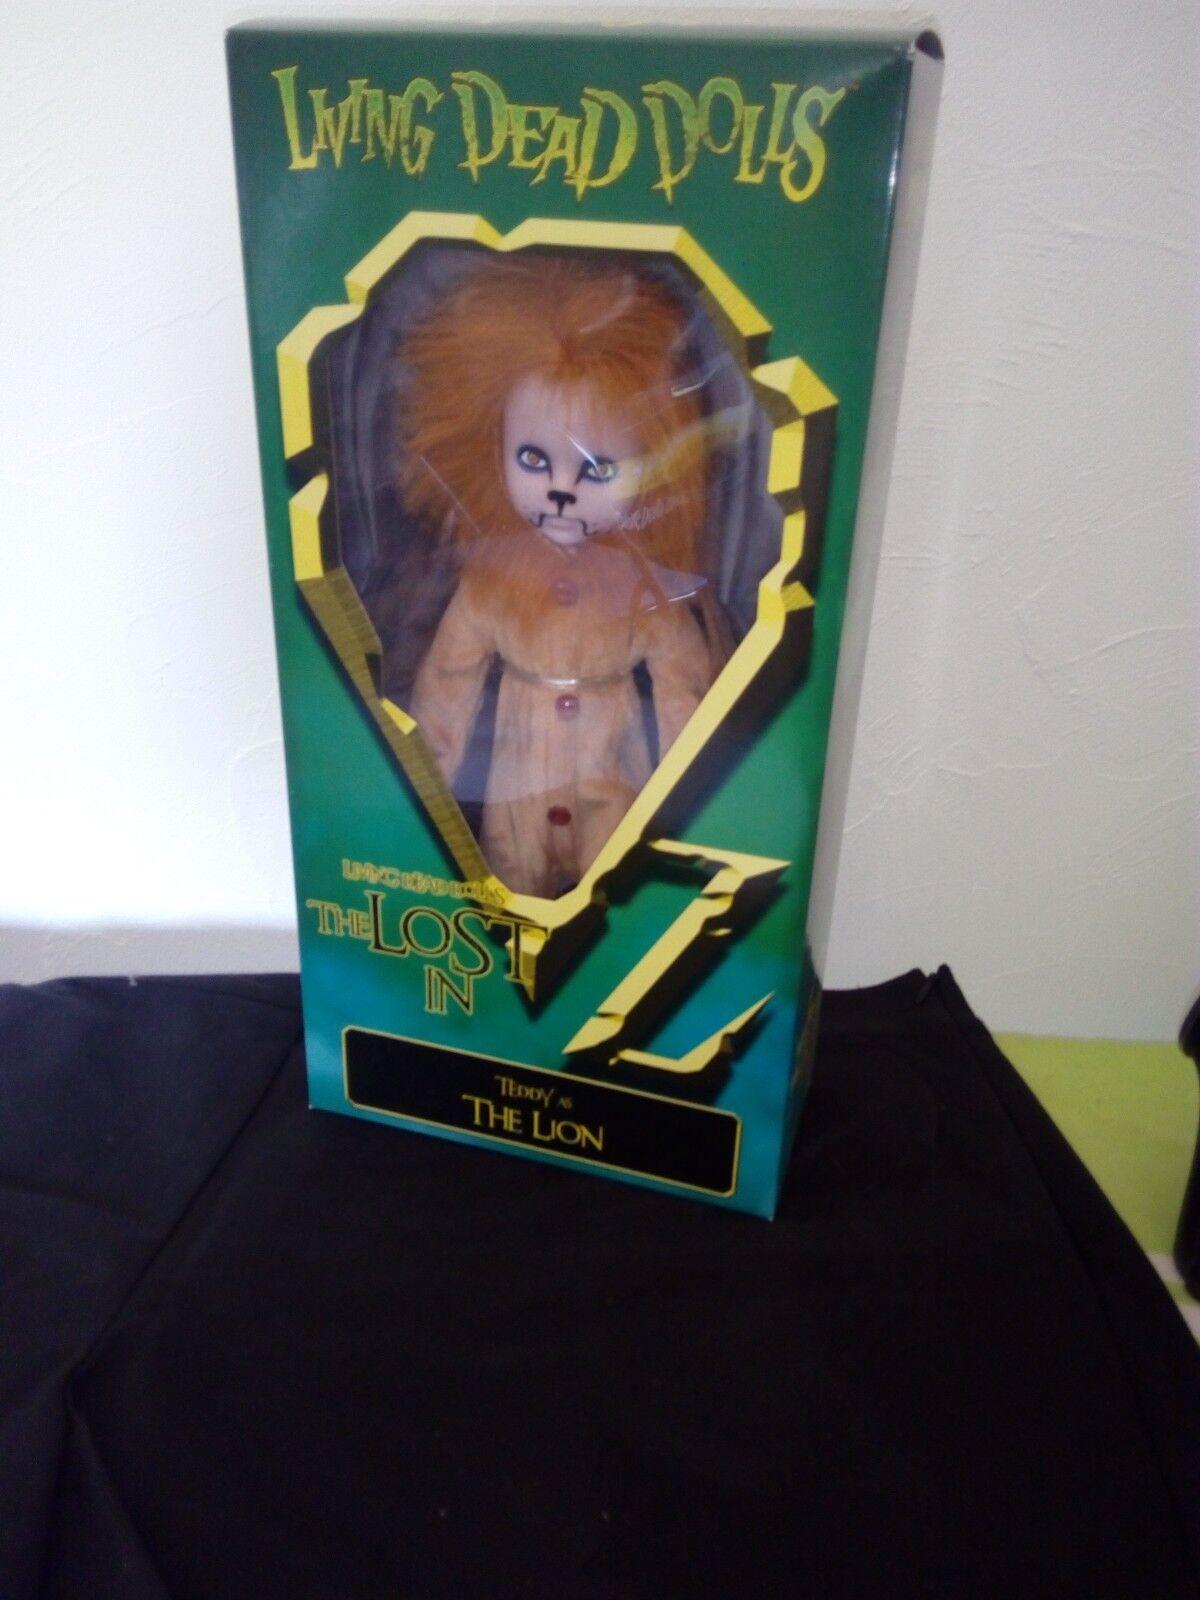 presa LIVING LIVING LIVING DEAD bambolaS LE MAGICIEN D'OZ LE LION  NEUF  consegna e reso gratuiti